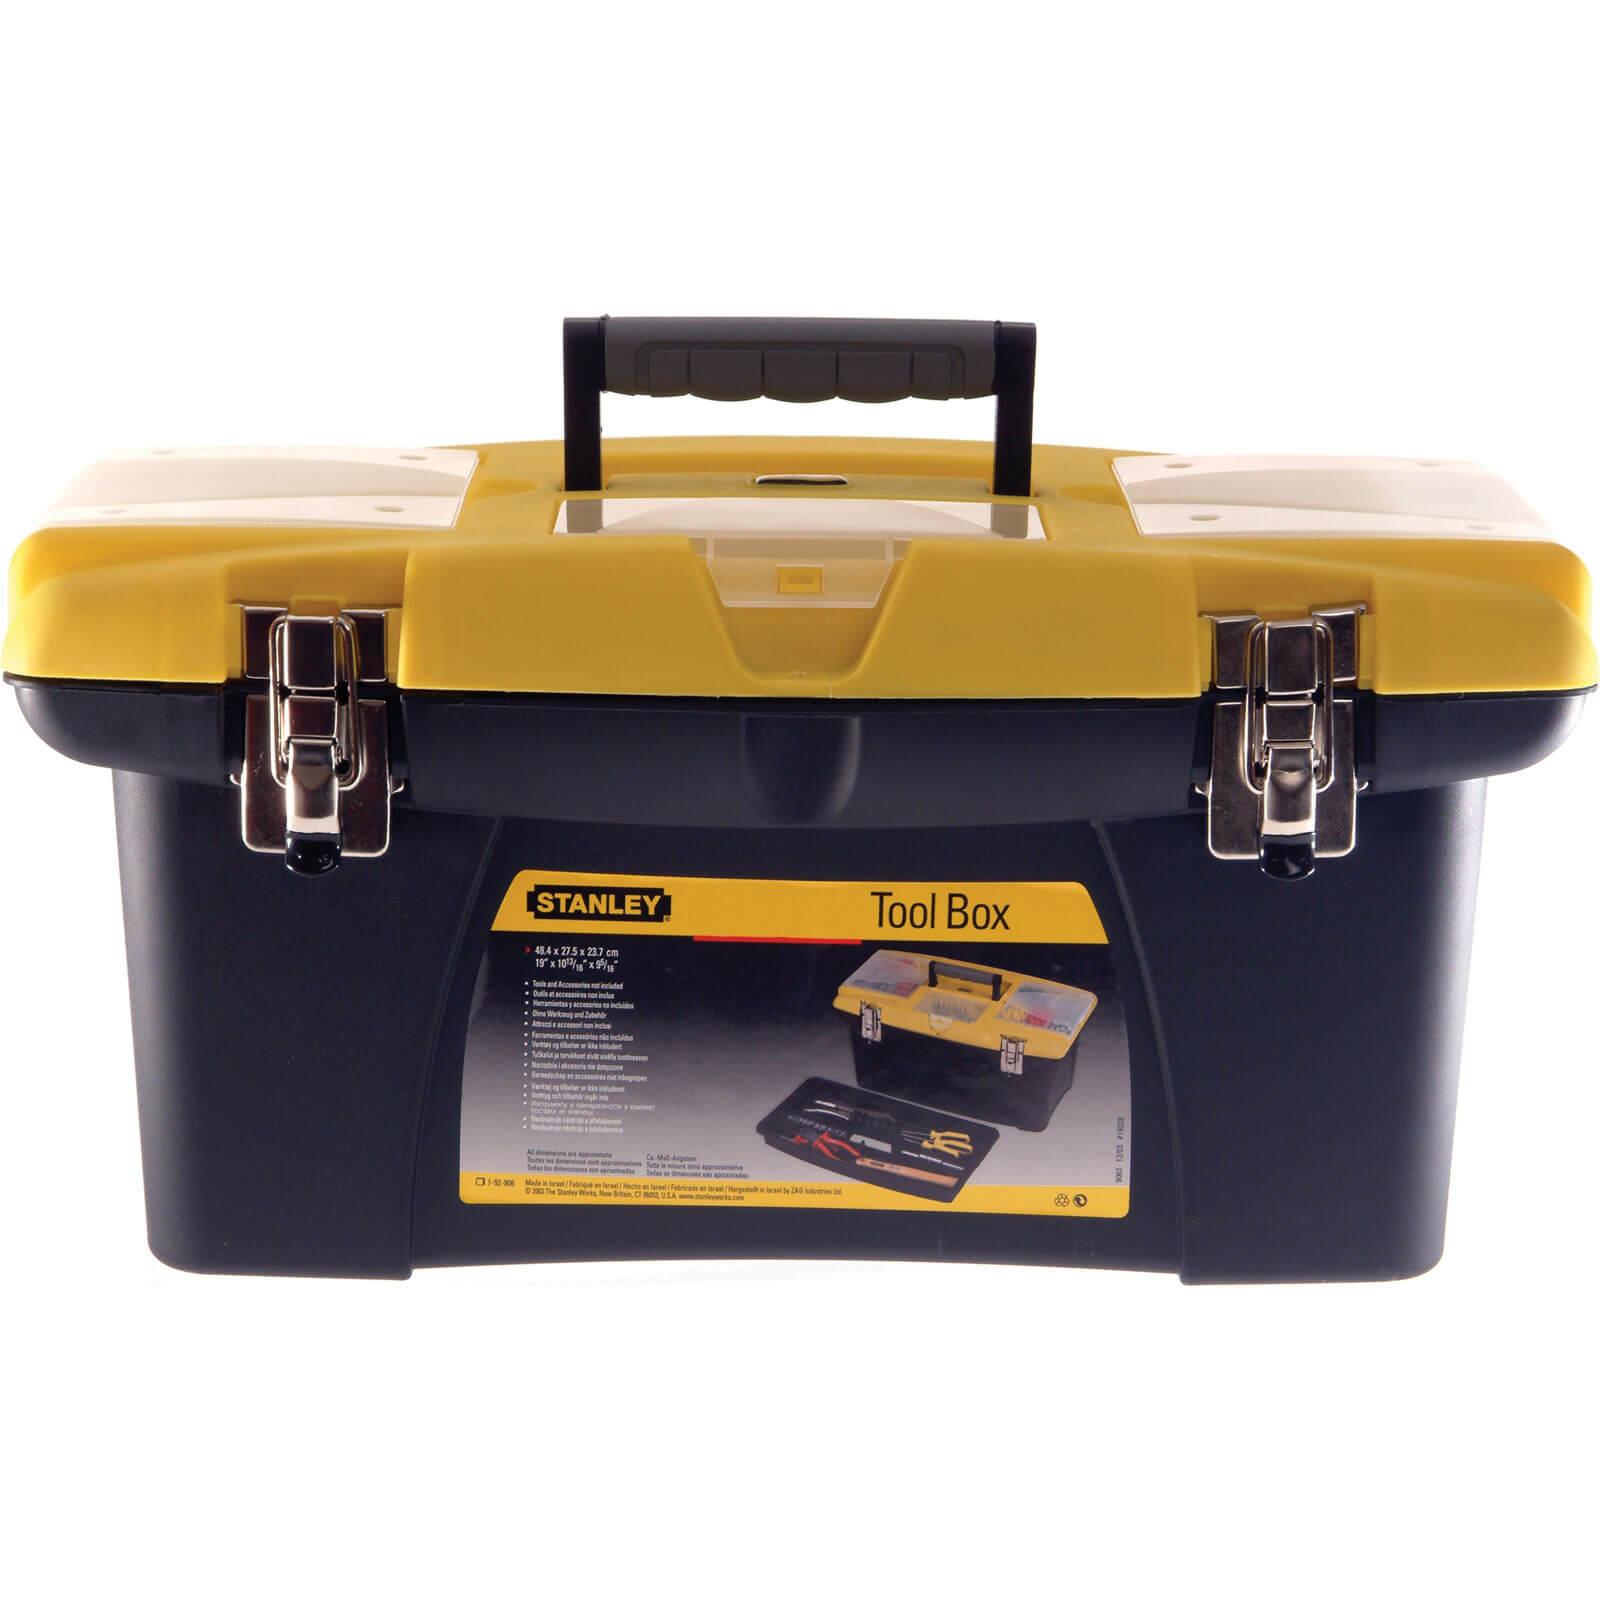 Image of Stanley Jumbo Plastic Toolbox 400mm